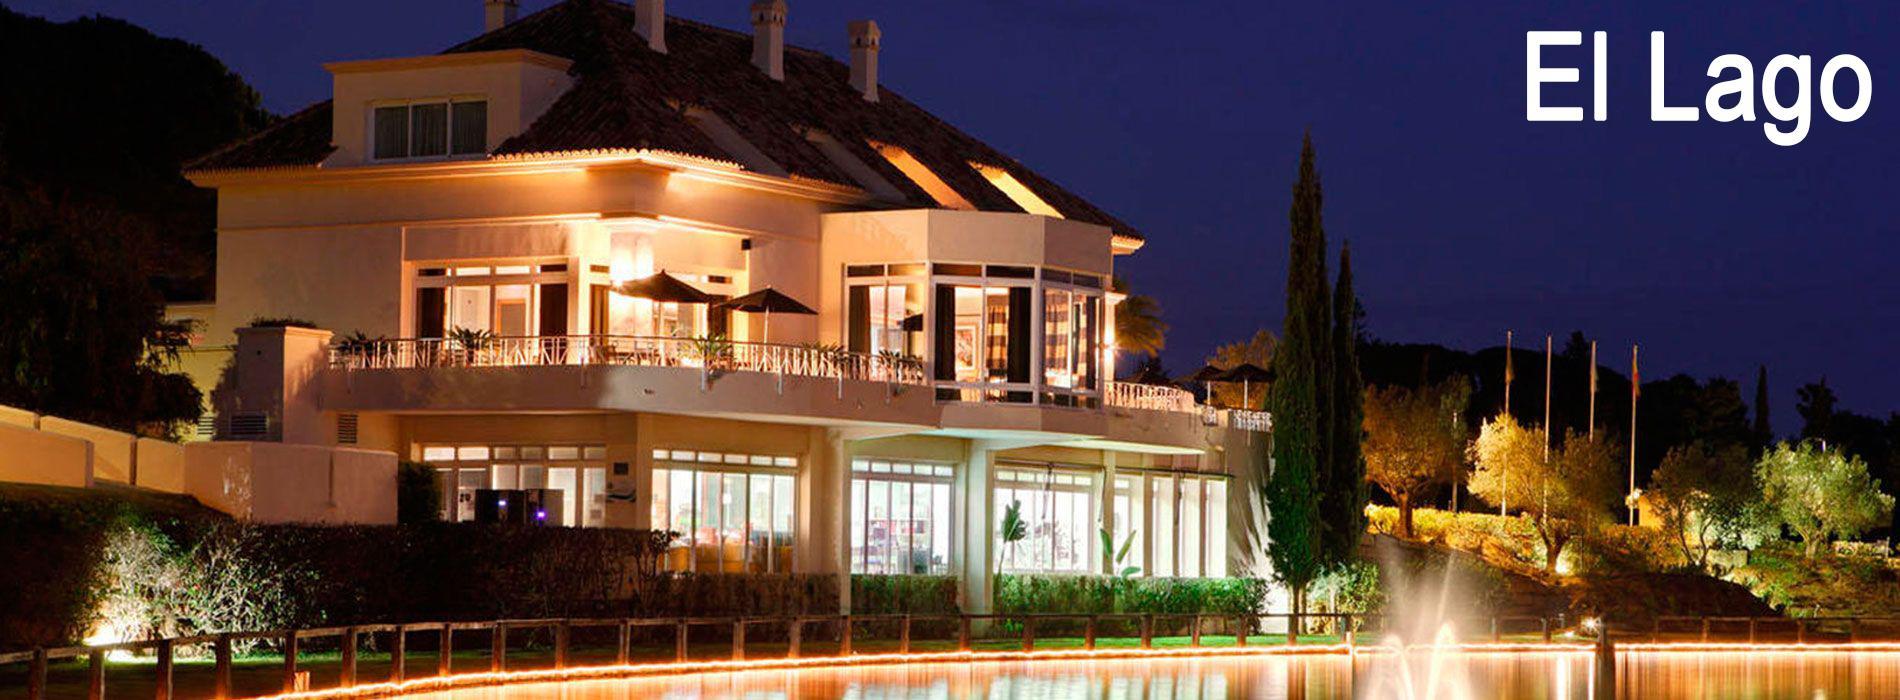 Michelin star restaurant in Marbella